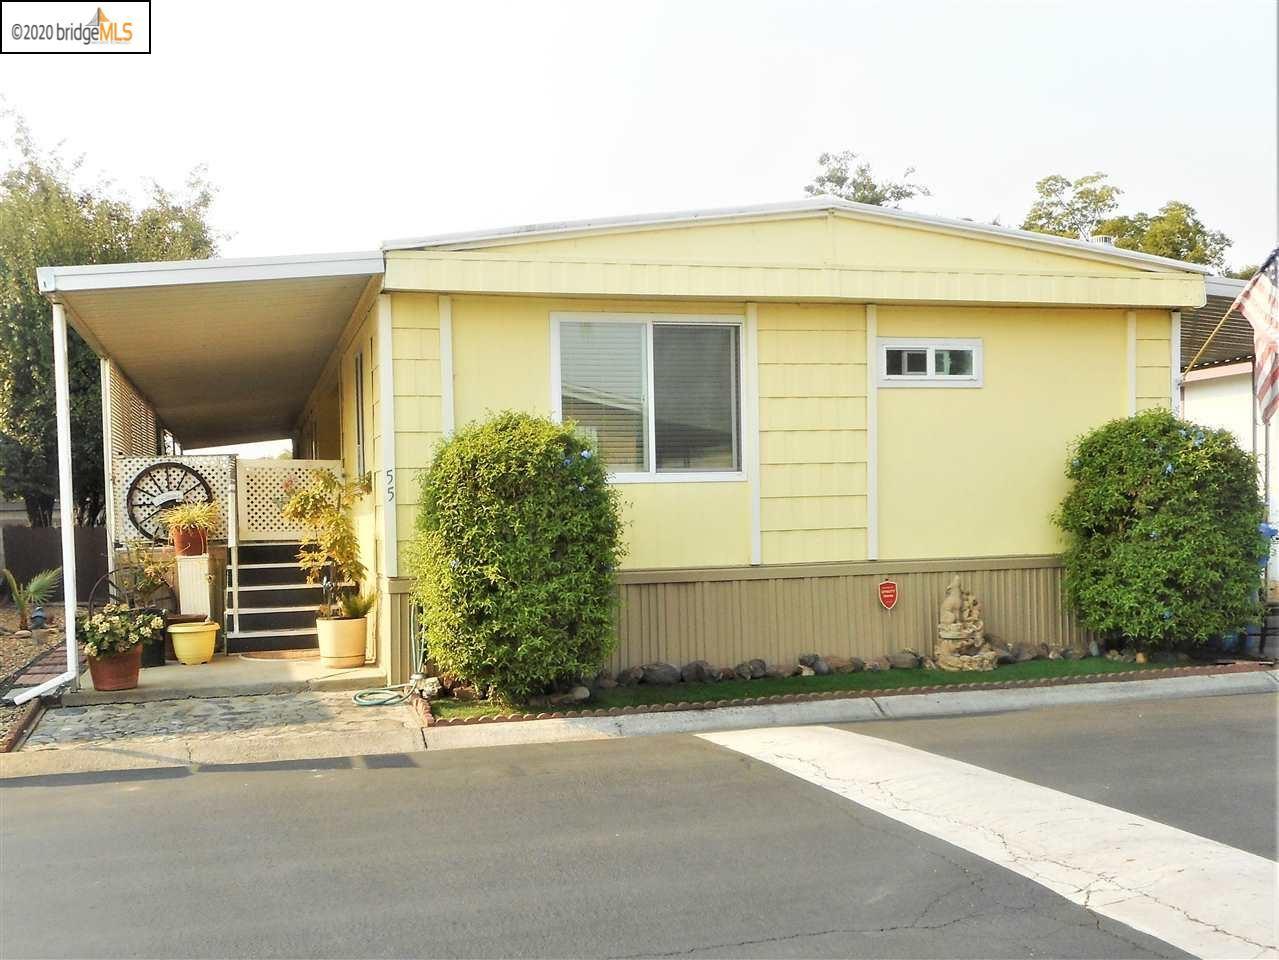 4603 Balfour Rd. #55, Brentwood, CA 94513 - MLS#: 40918893